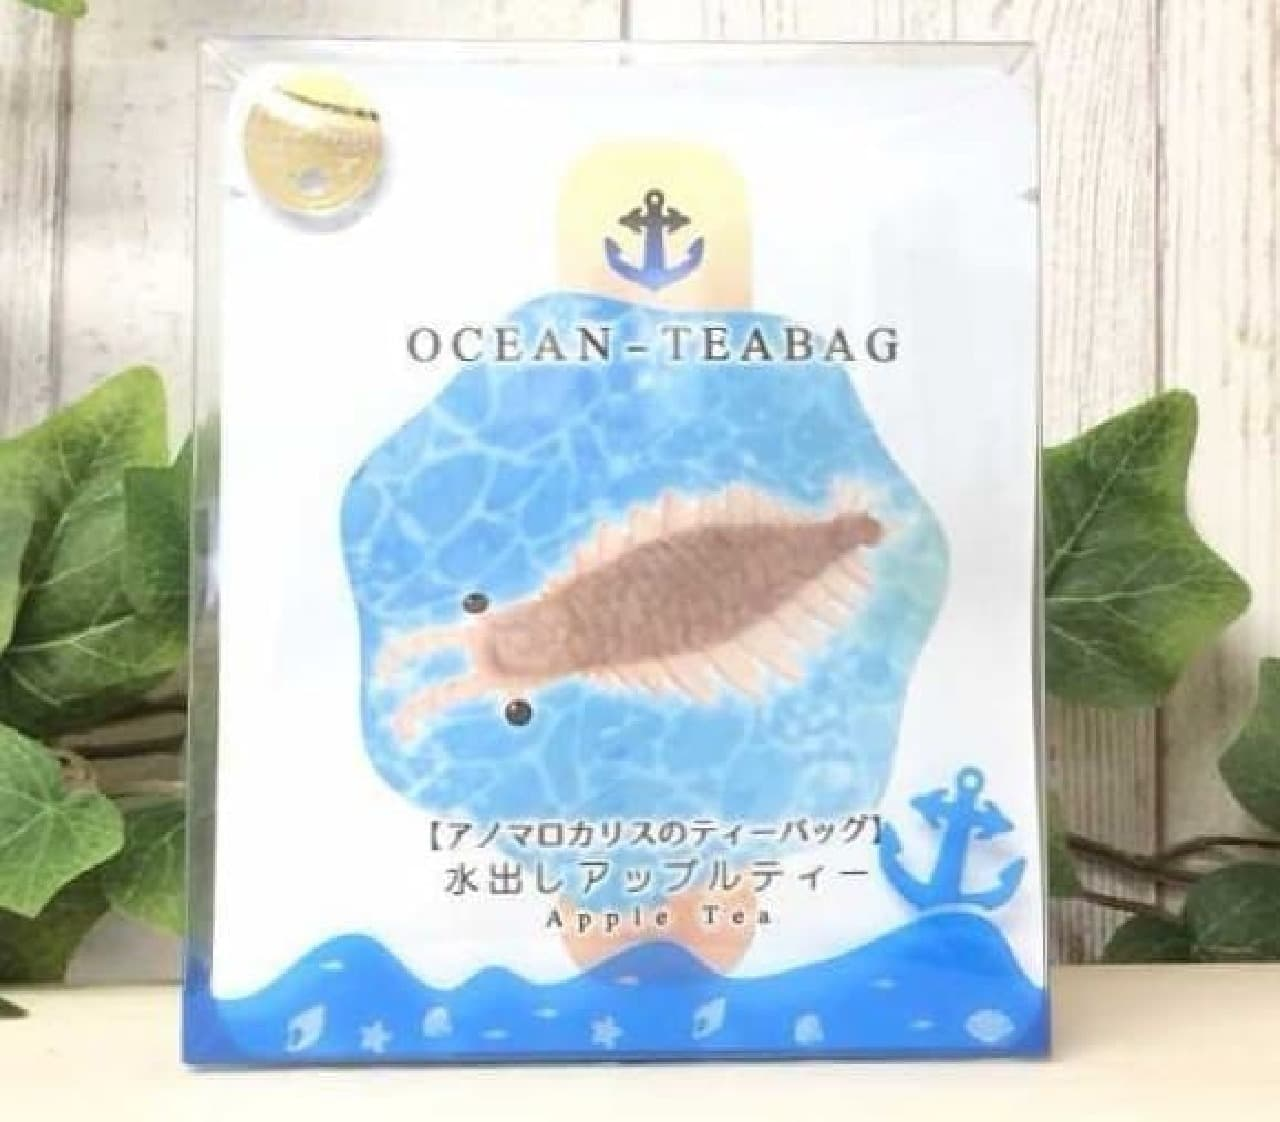 ocean-teabag「デボン紀(4種セット)」